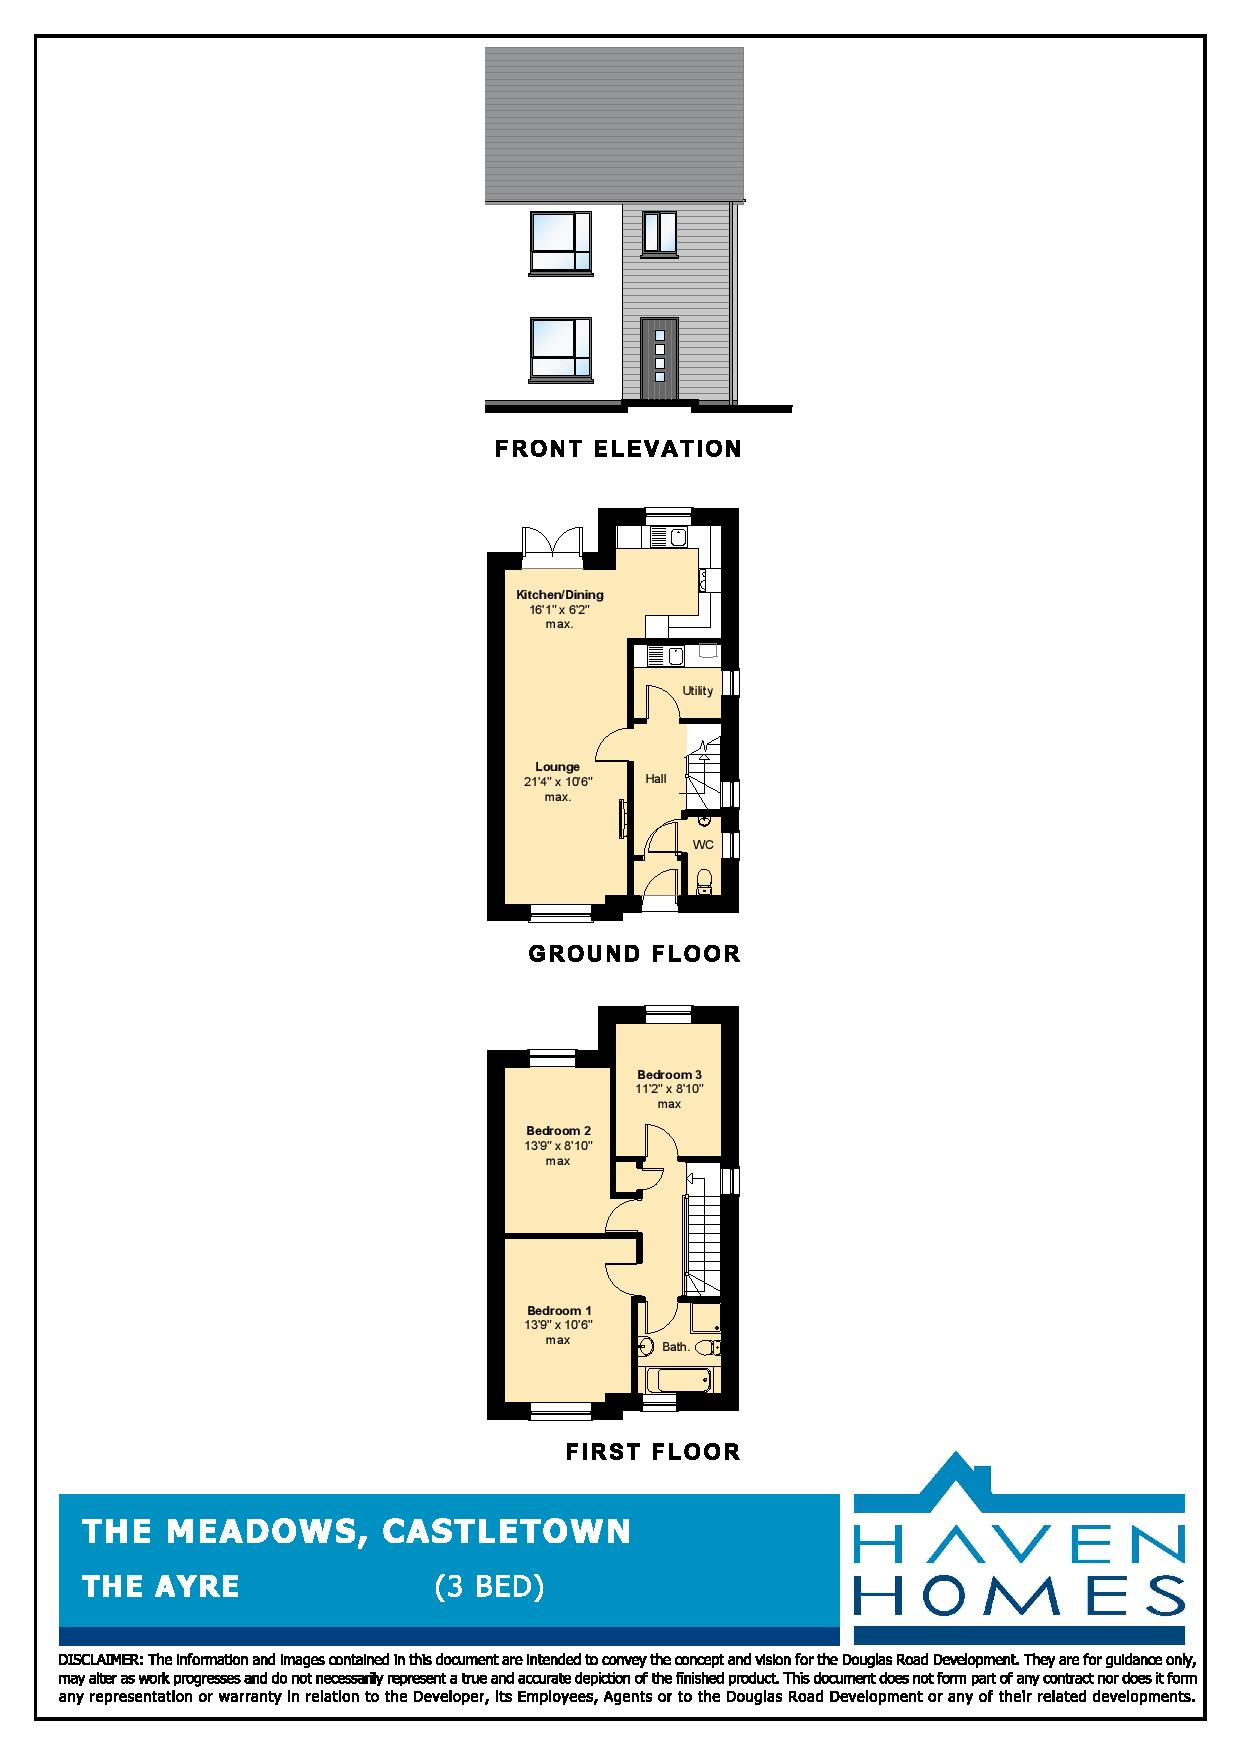 Plot 82, The Meadows, Castletown Floorplan